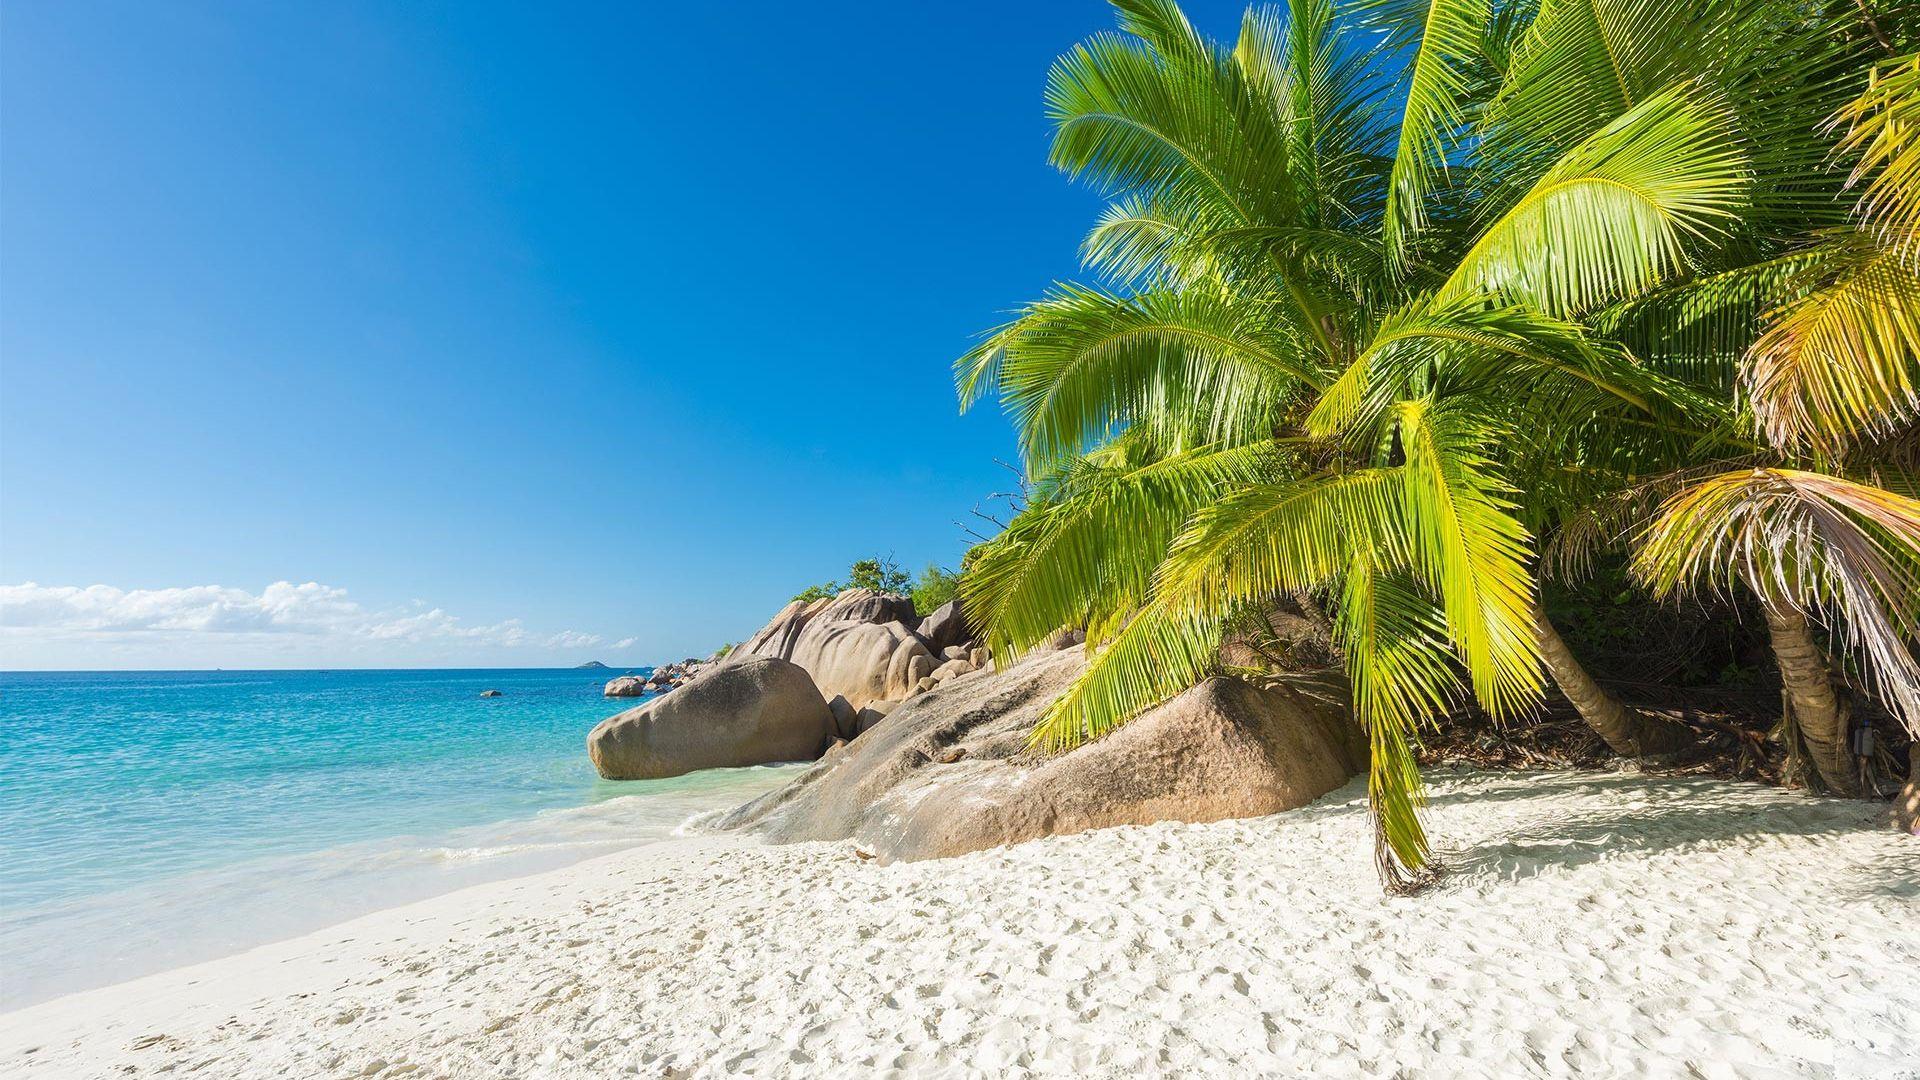 Sejur plaja Insula Mahe, Seychelles, 9 zile